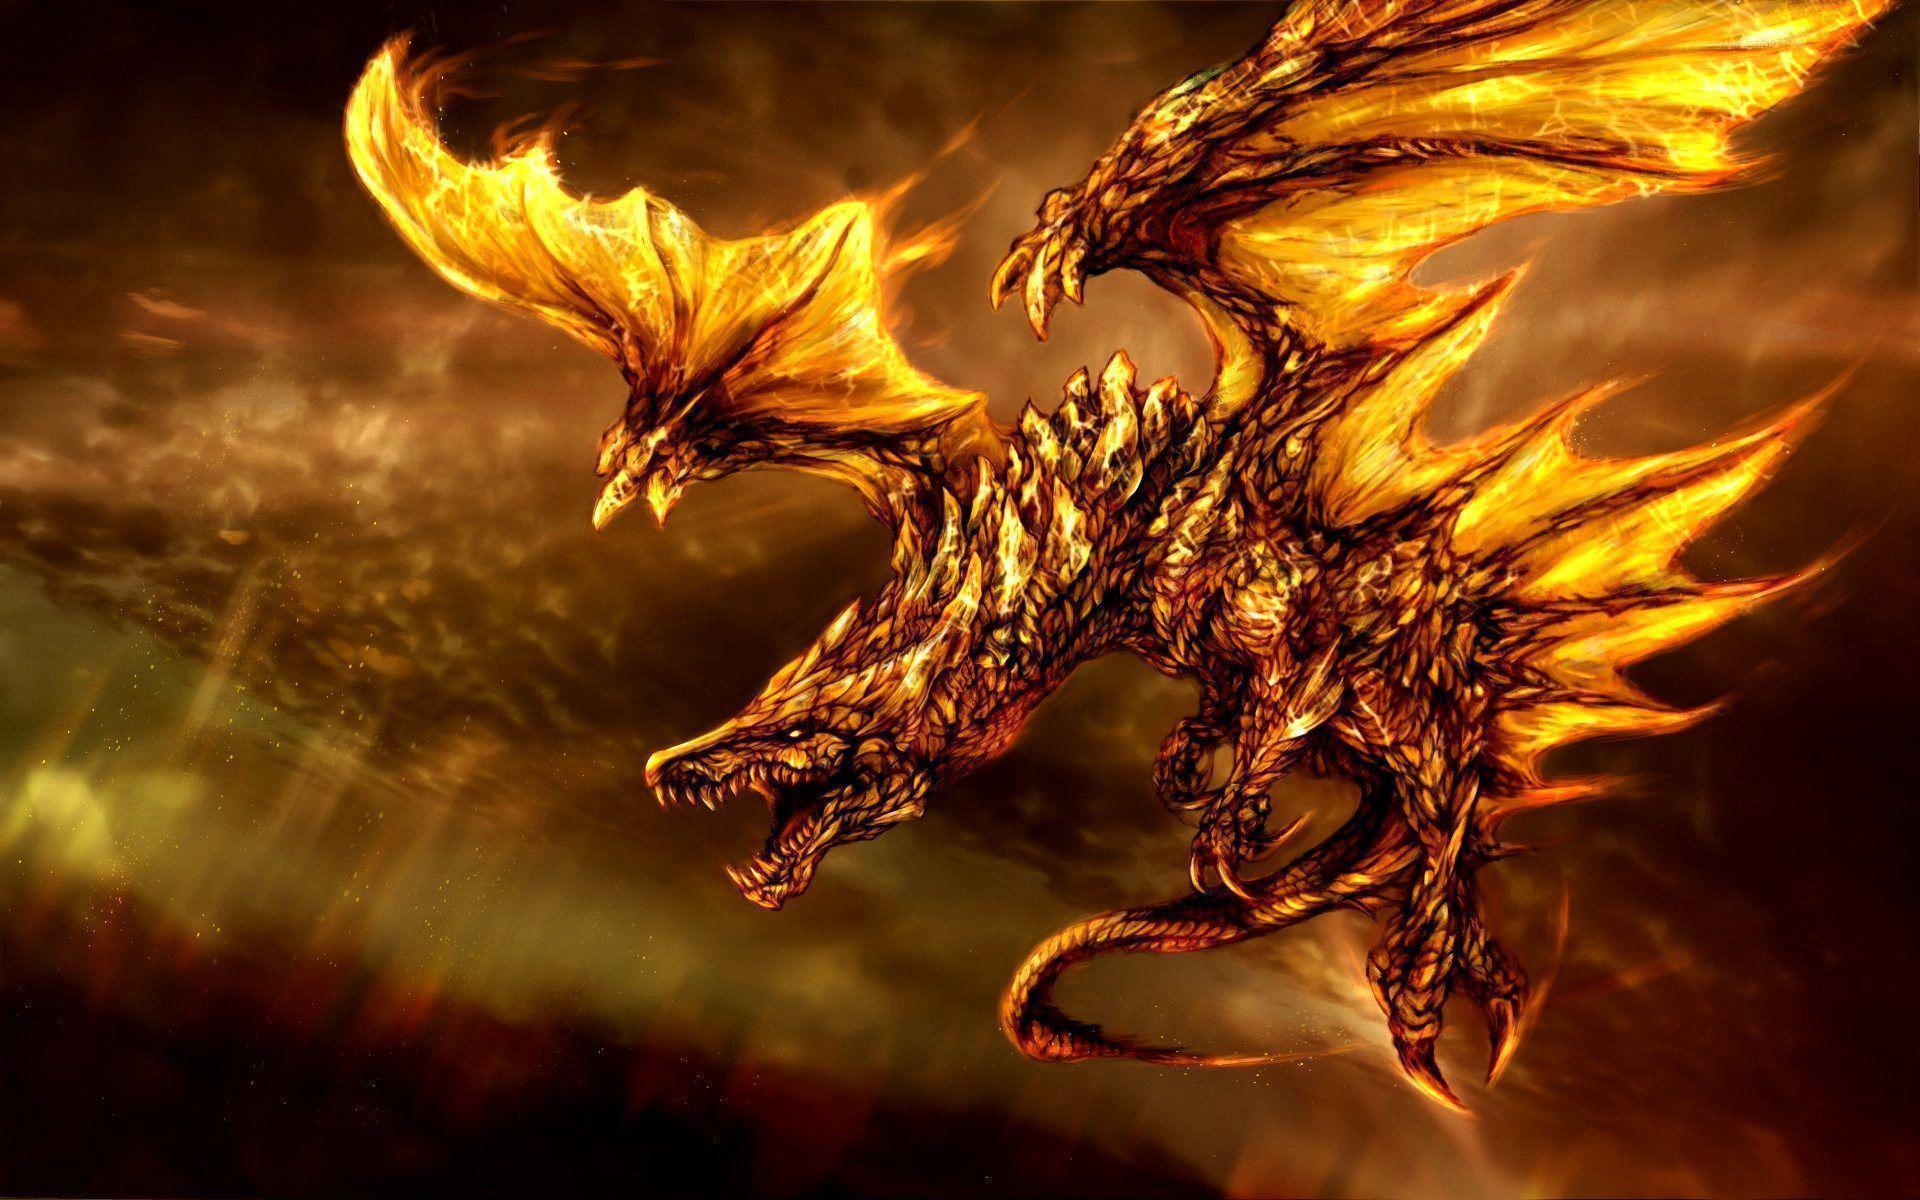 Funmozar D Dragon Wallpapers